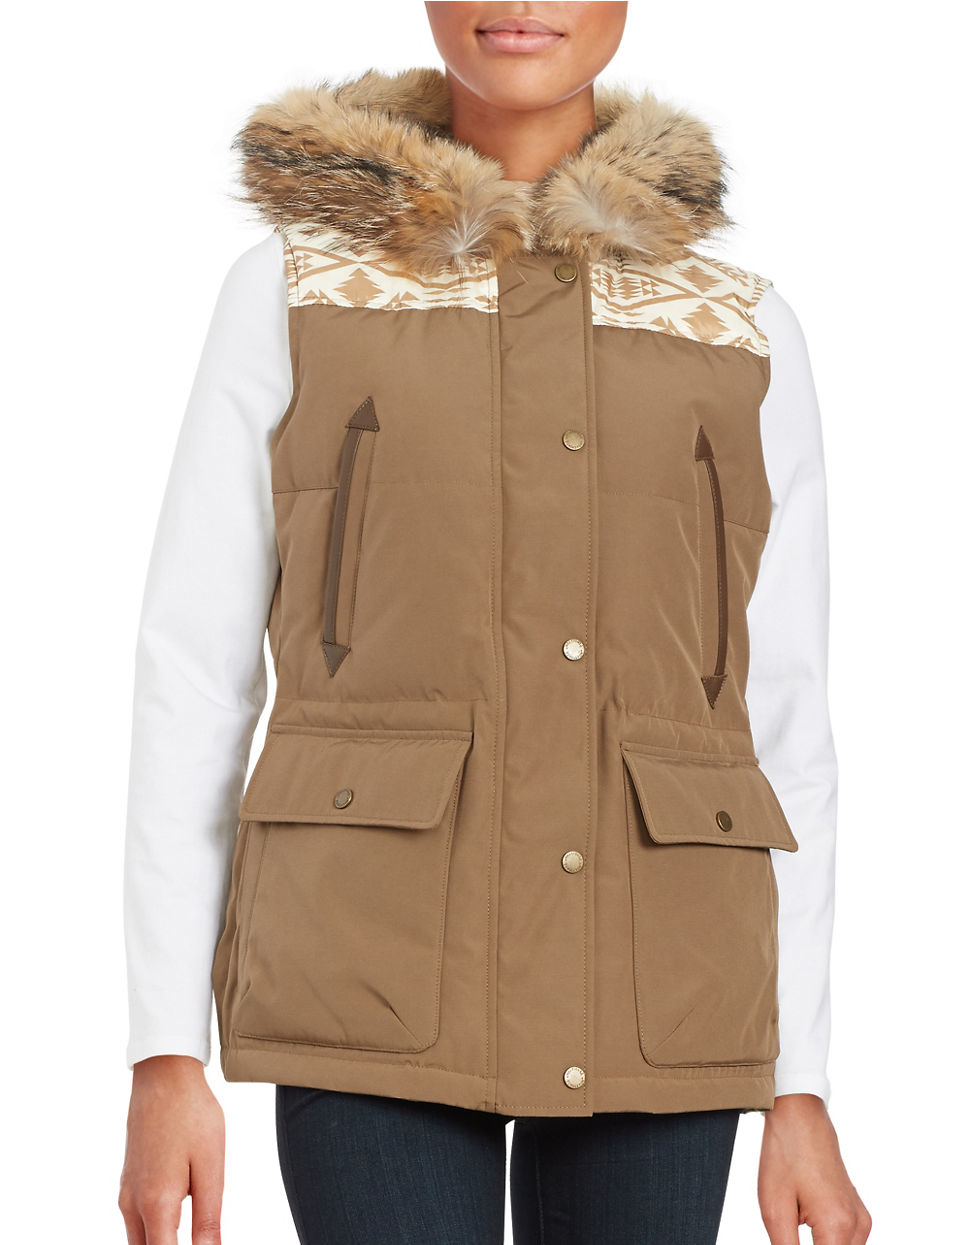 Find great deals on eBay for faux fur trim vest. Shop with confidence.